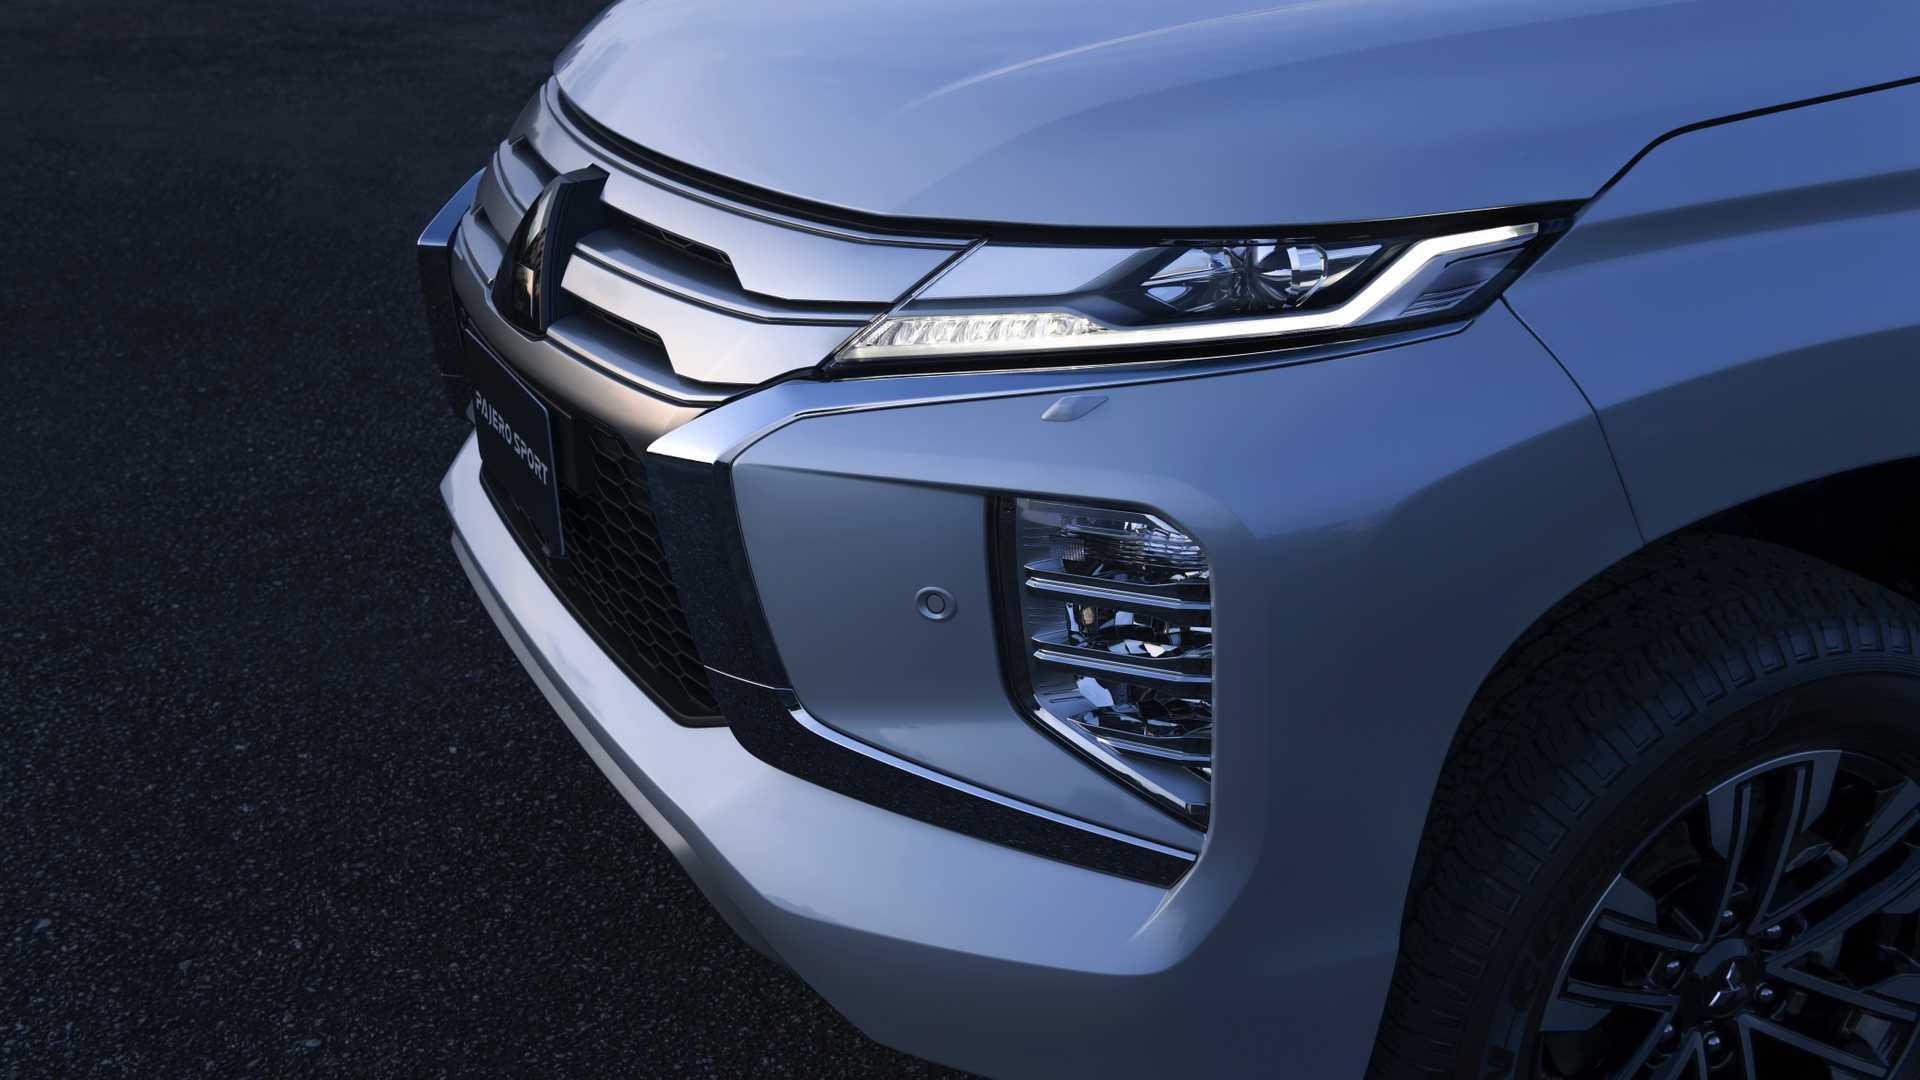 2020_Mitsubishi_Pajero_Sport_facelift_0026